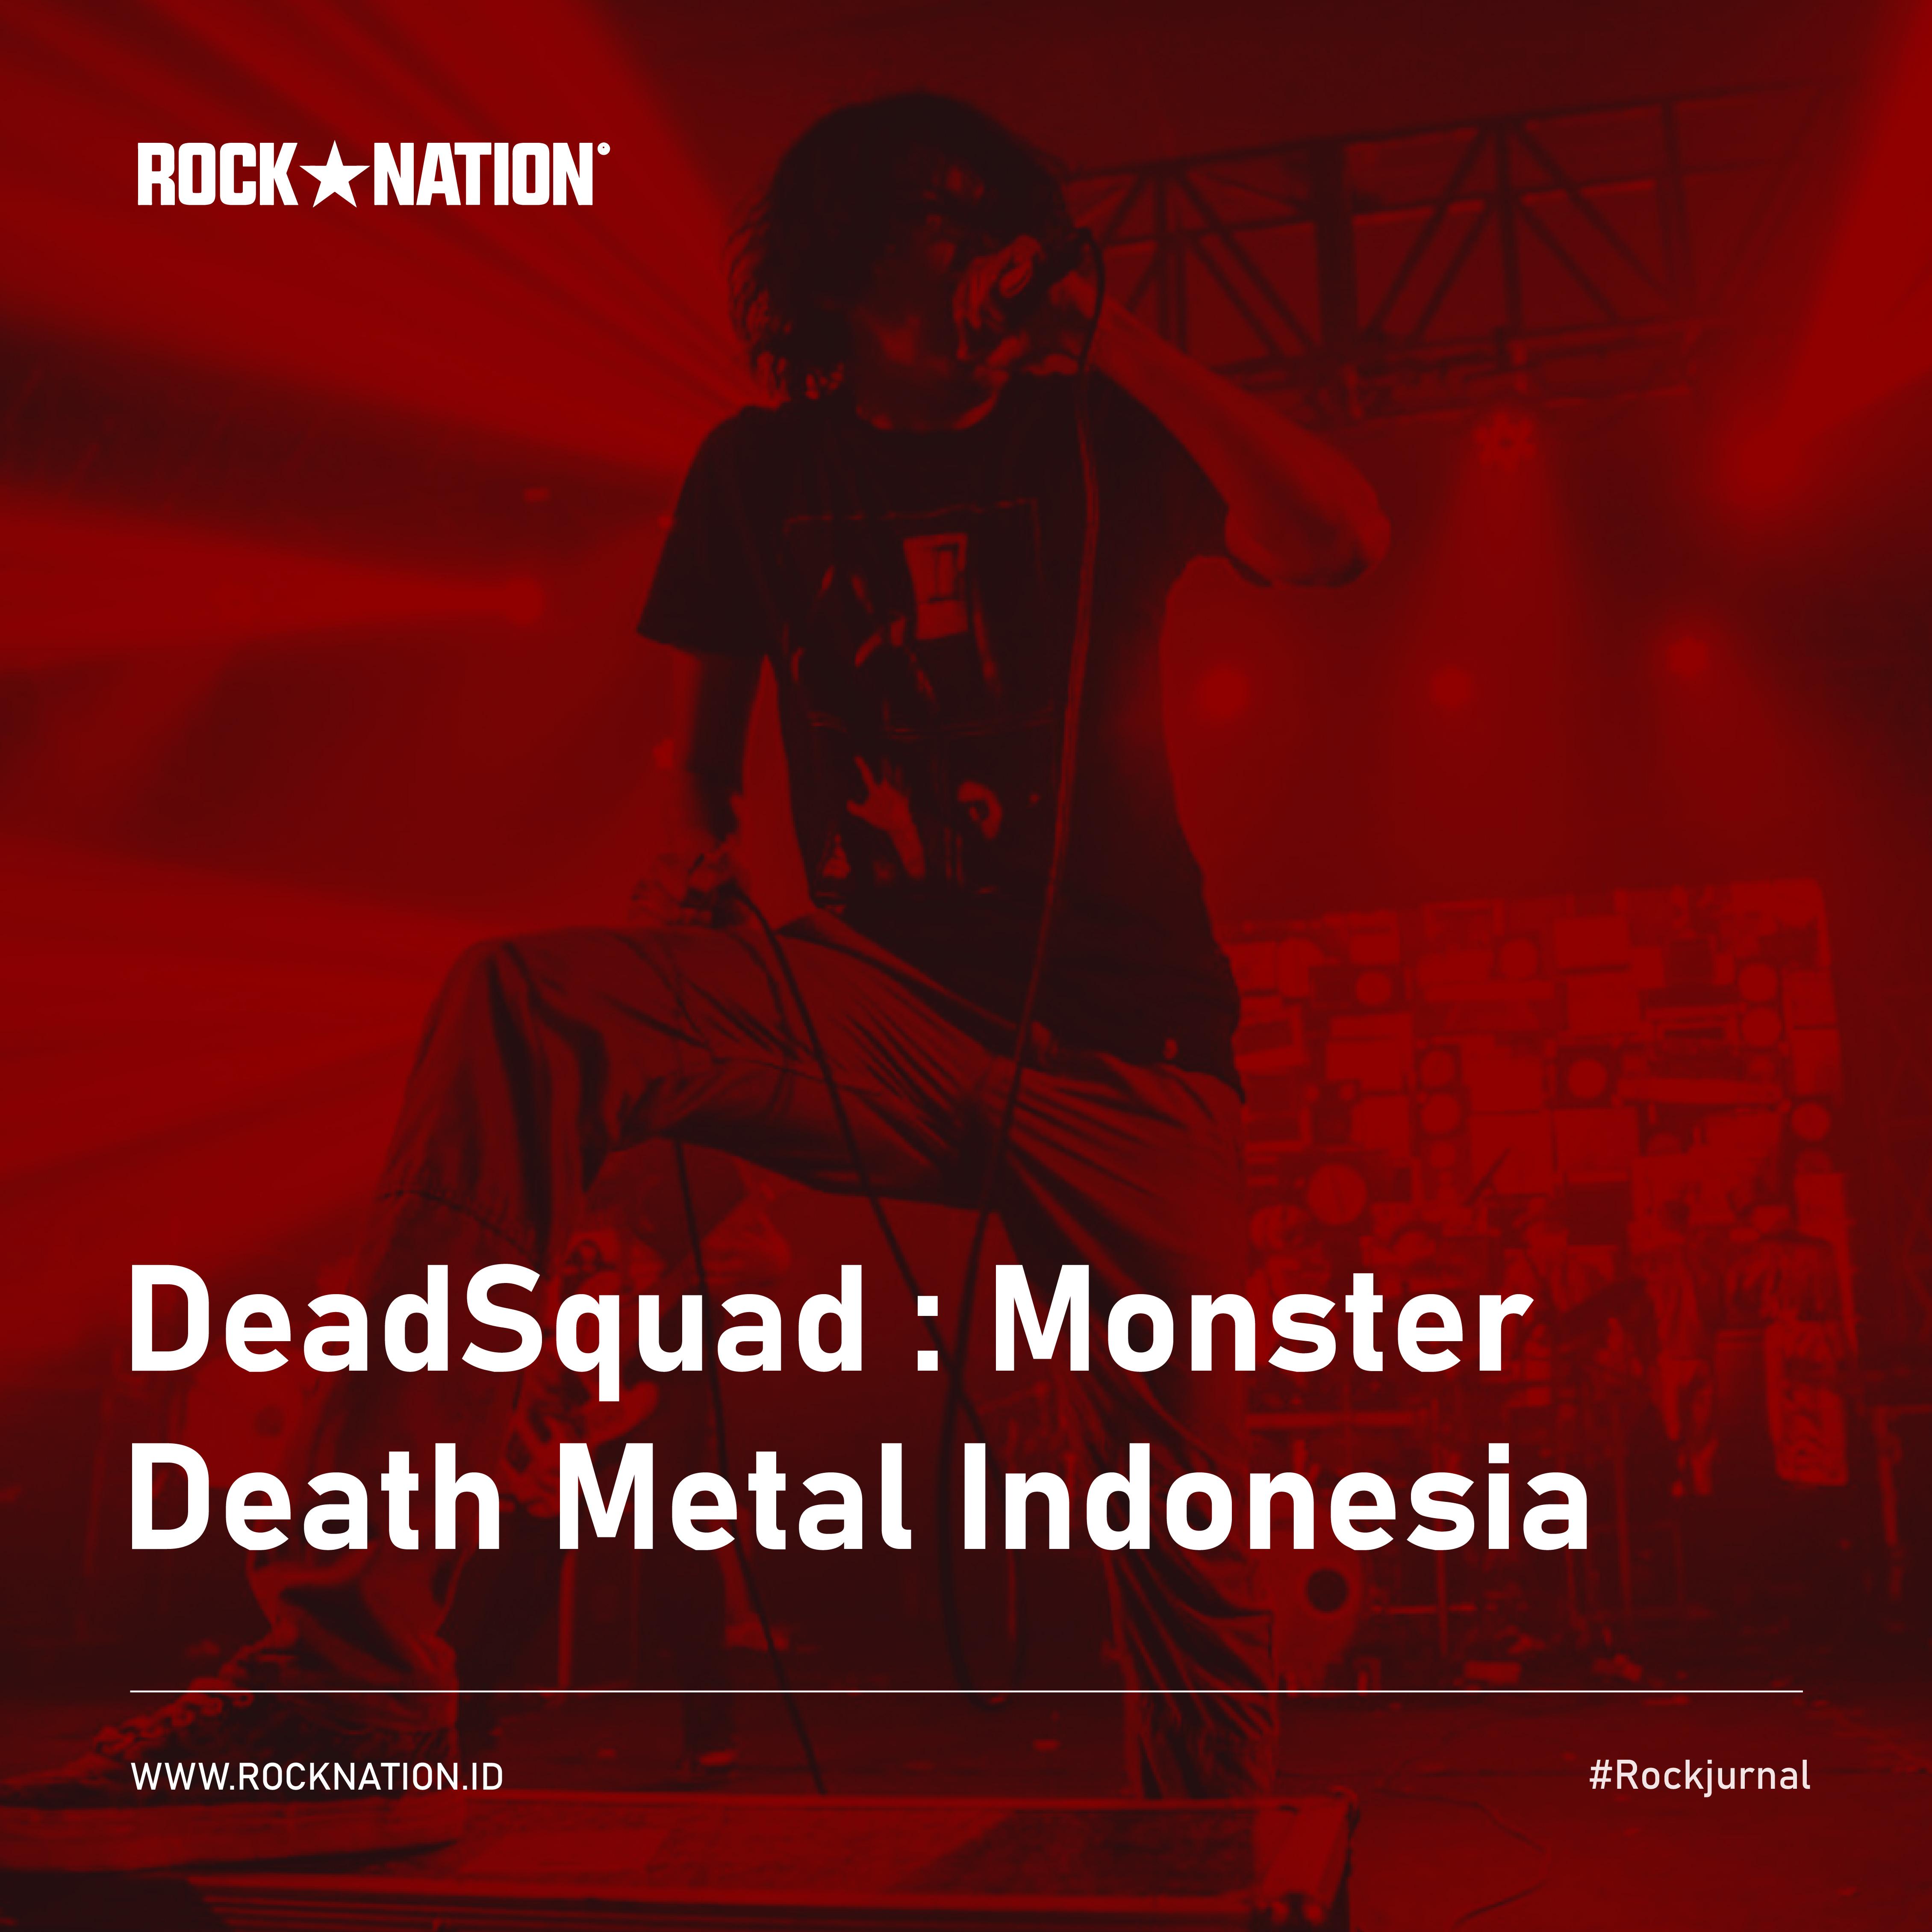 DeadSquad : Monster Death Metal Indonesia image